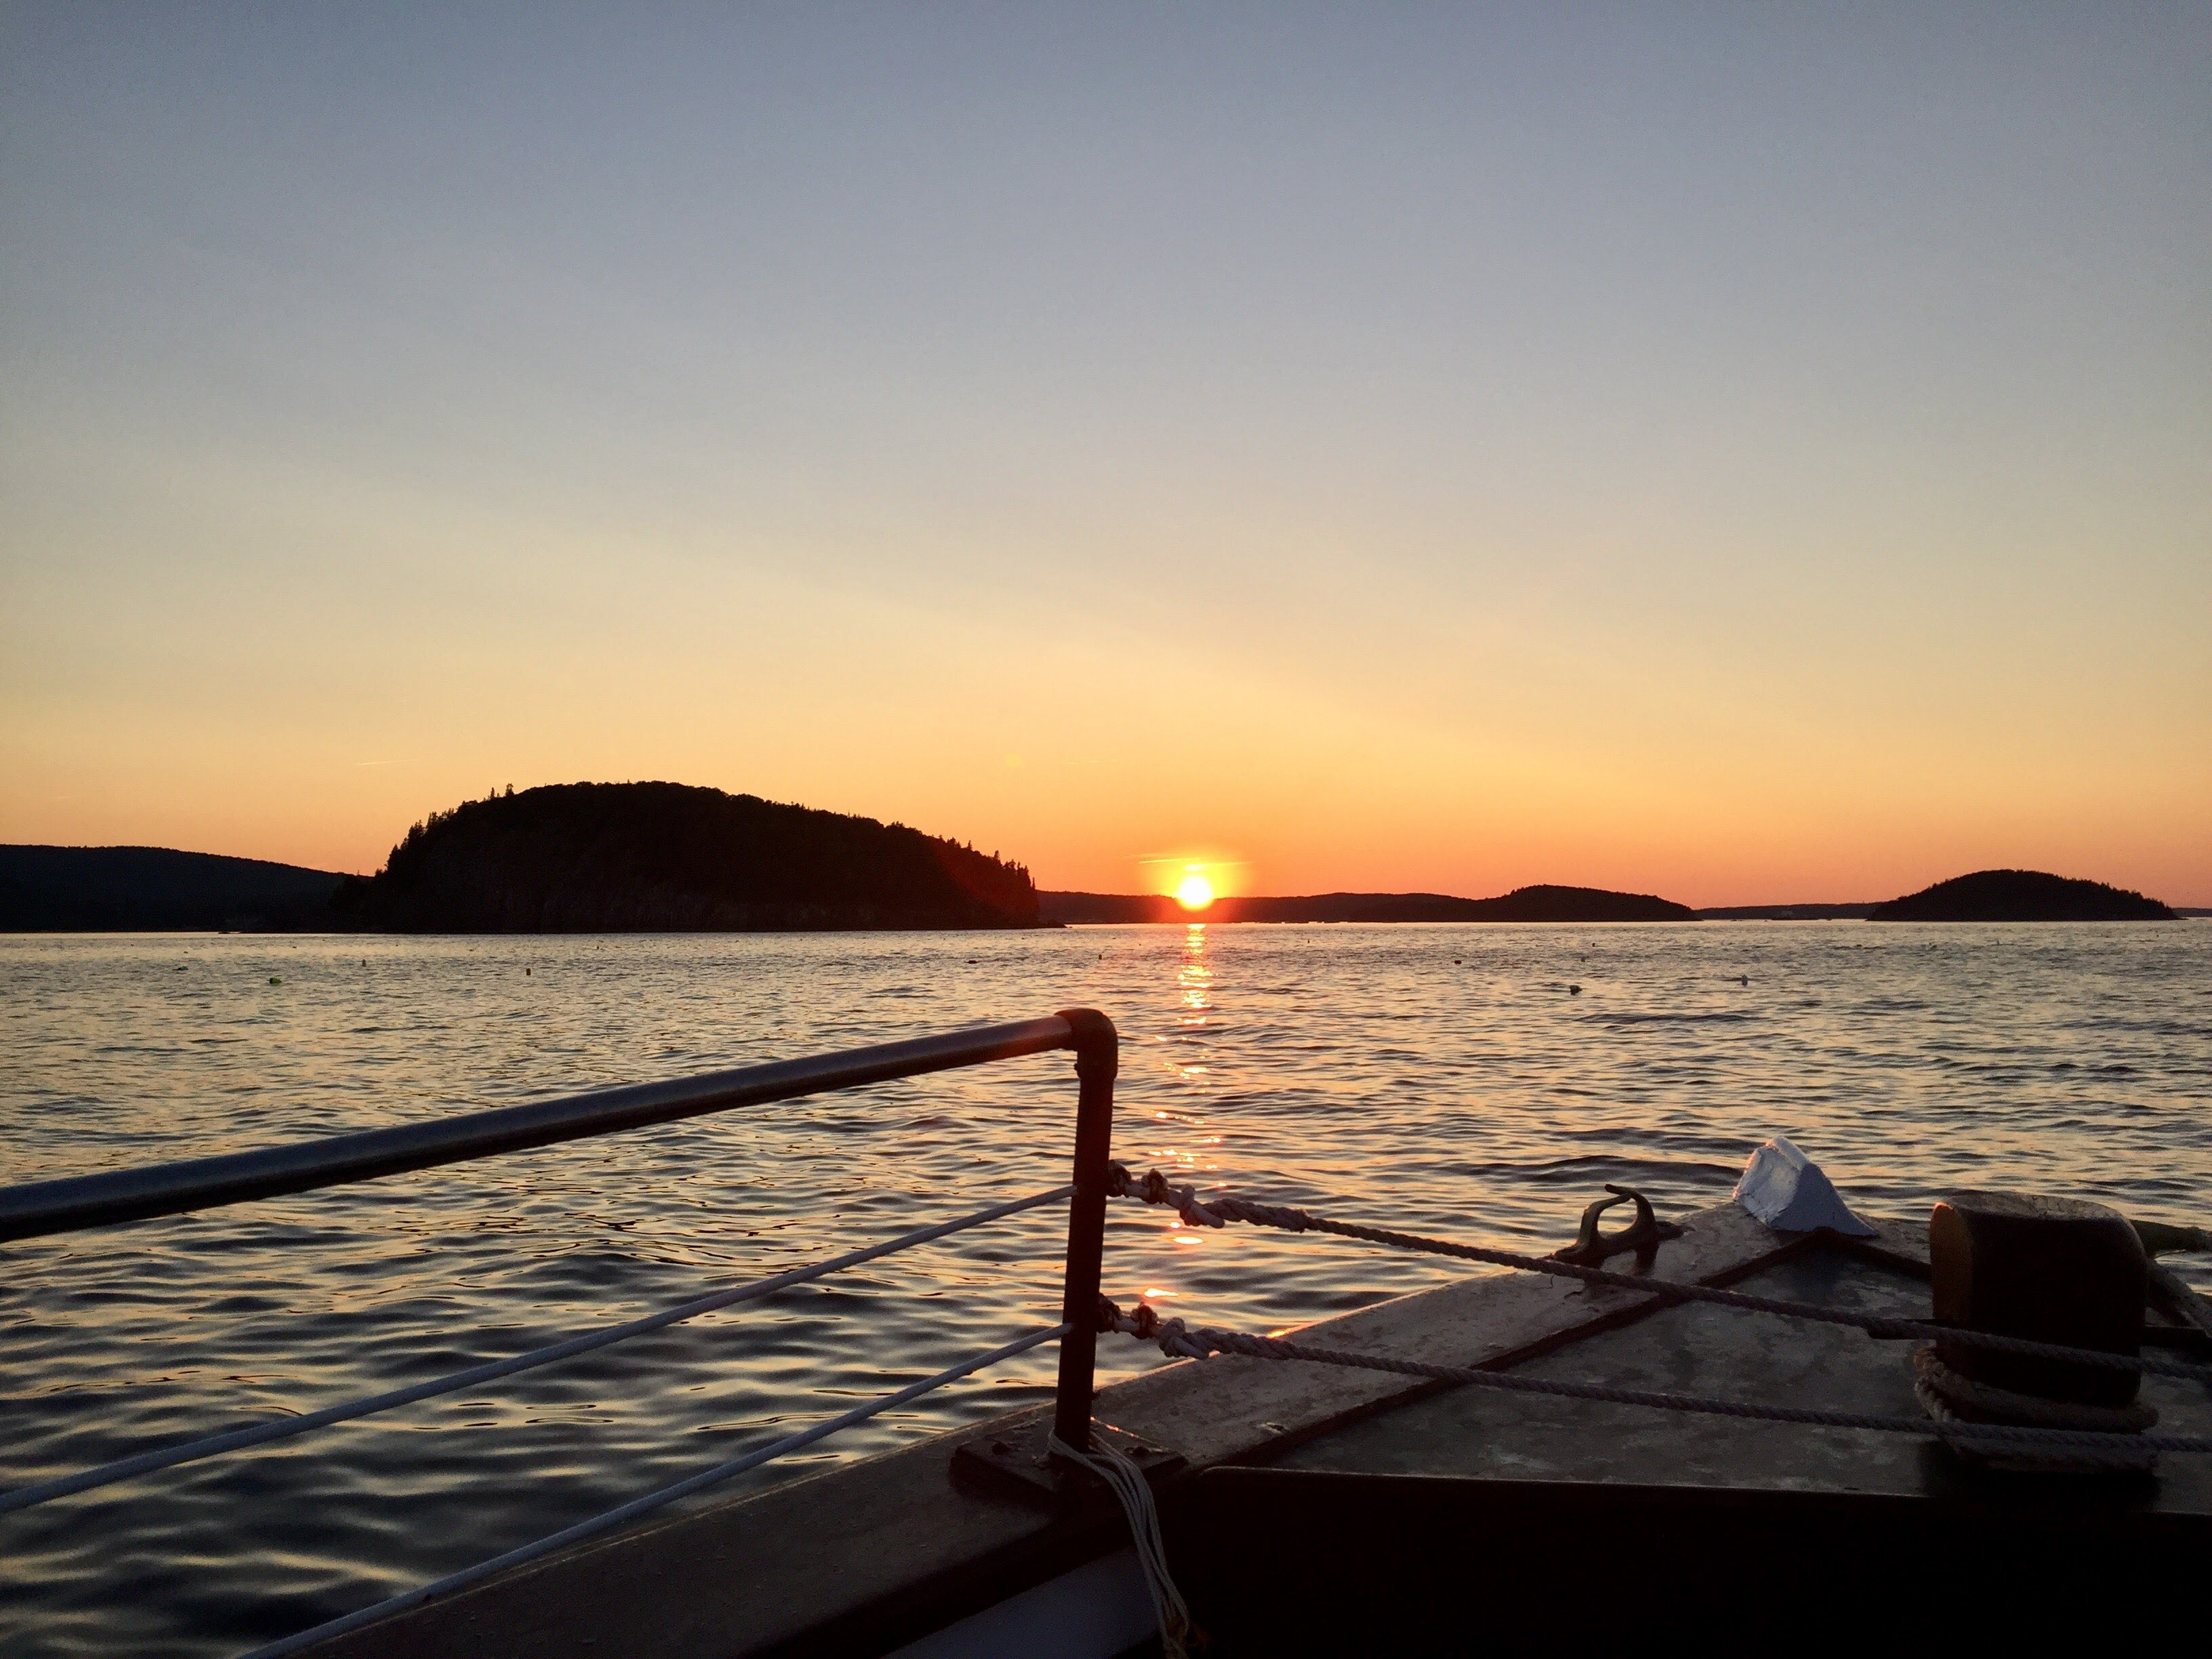 Sunset on the Bar Harbor Ferry to Schoodc/Winter harbor